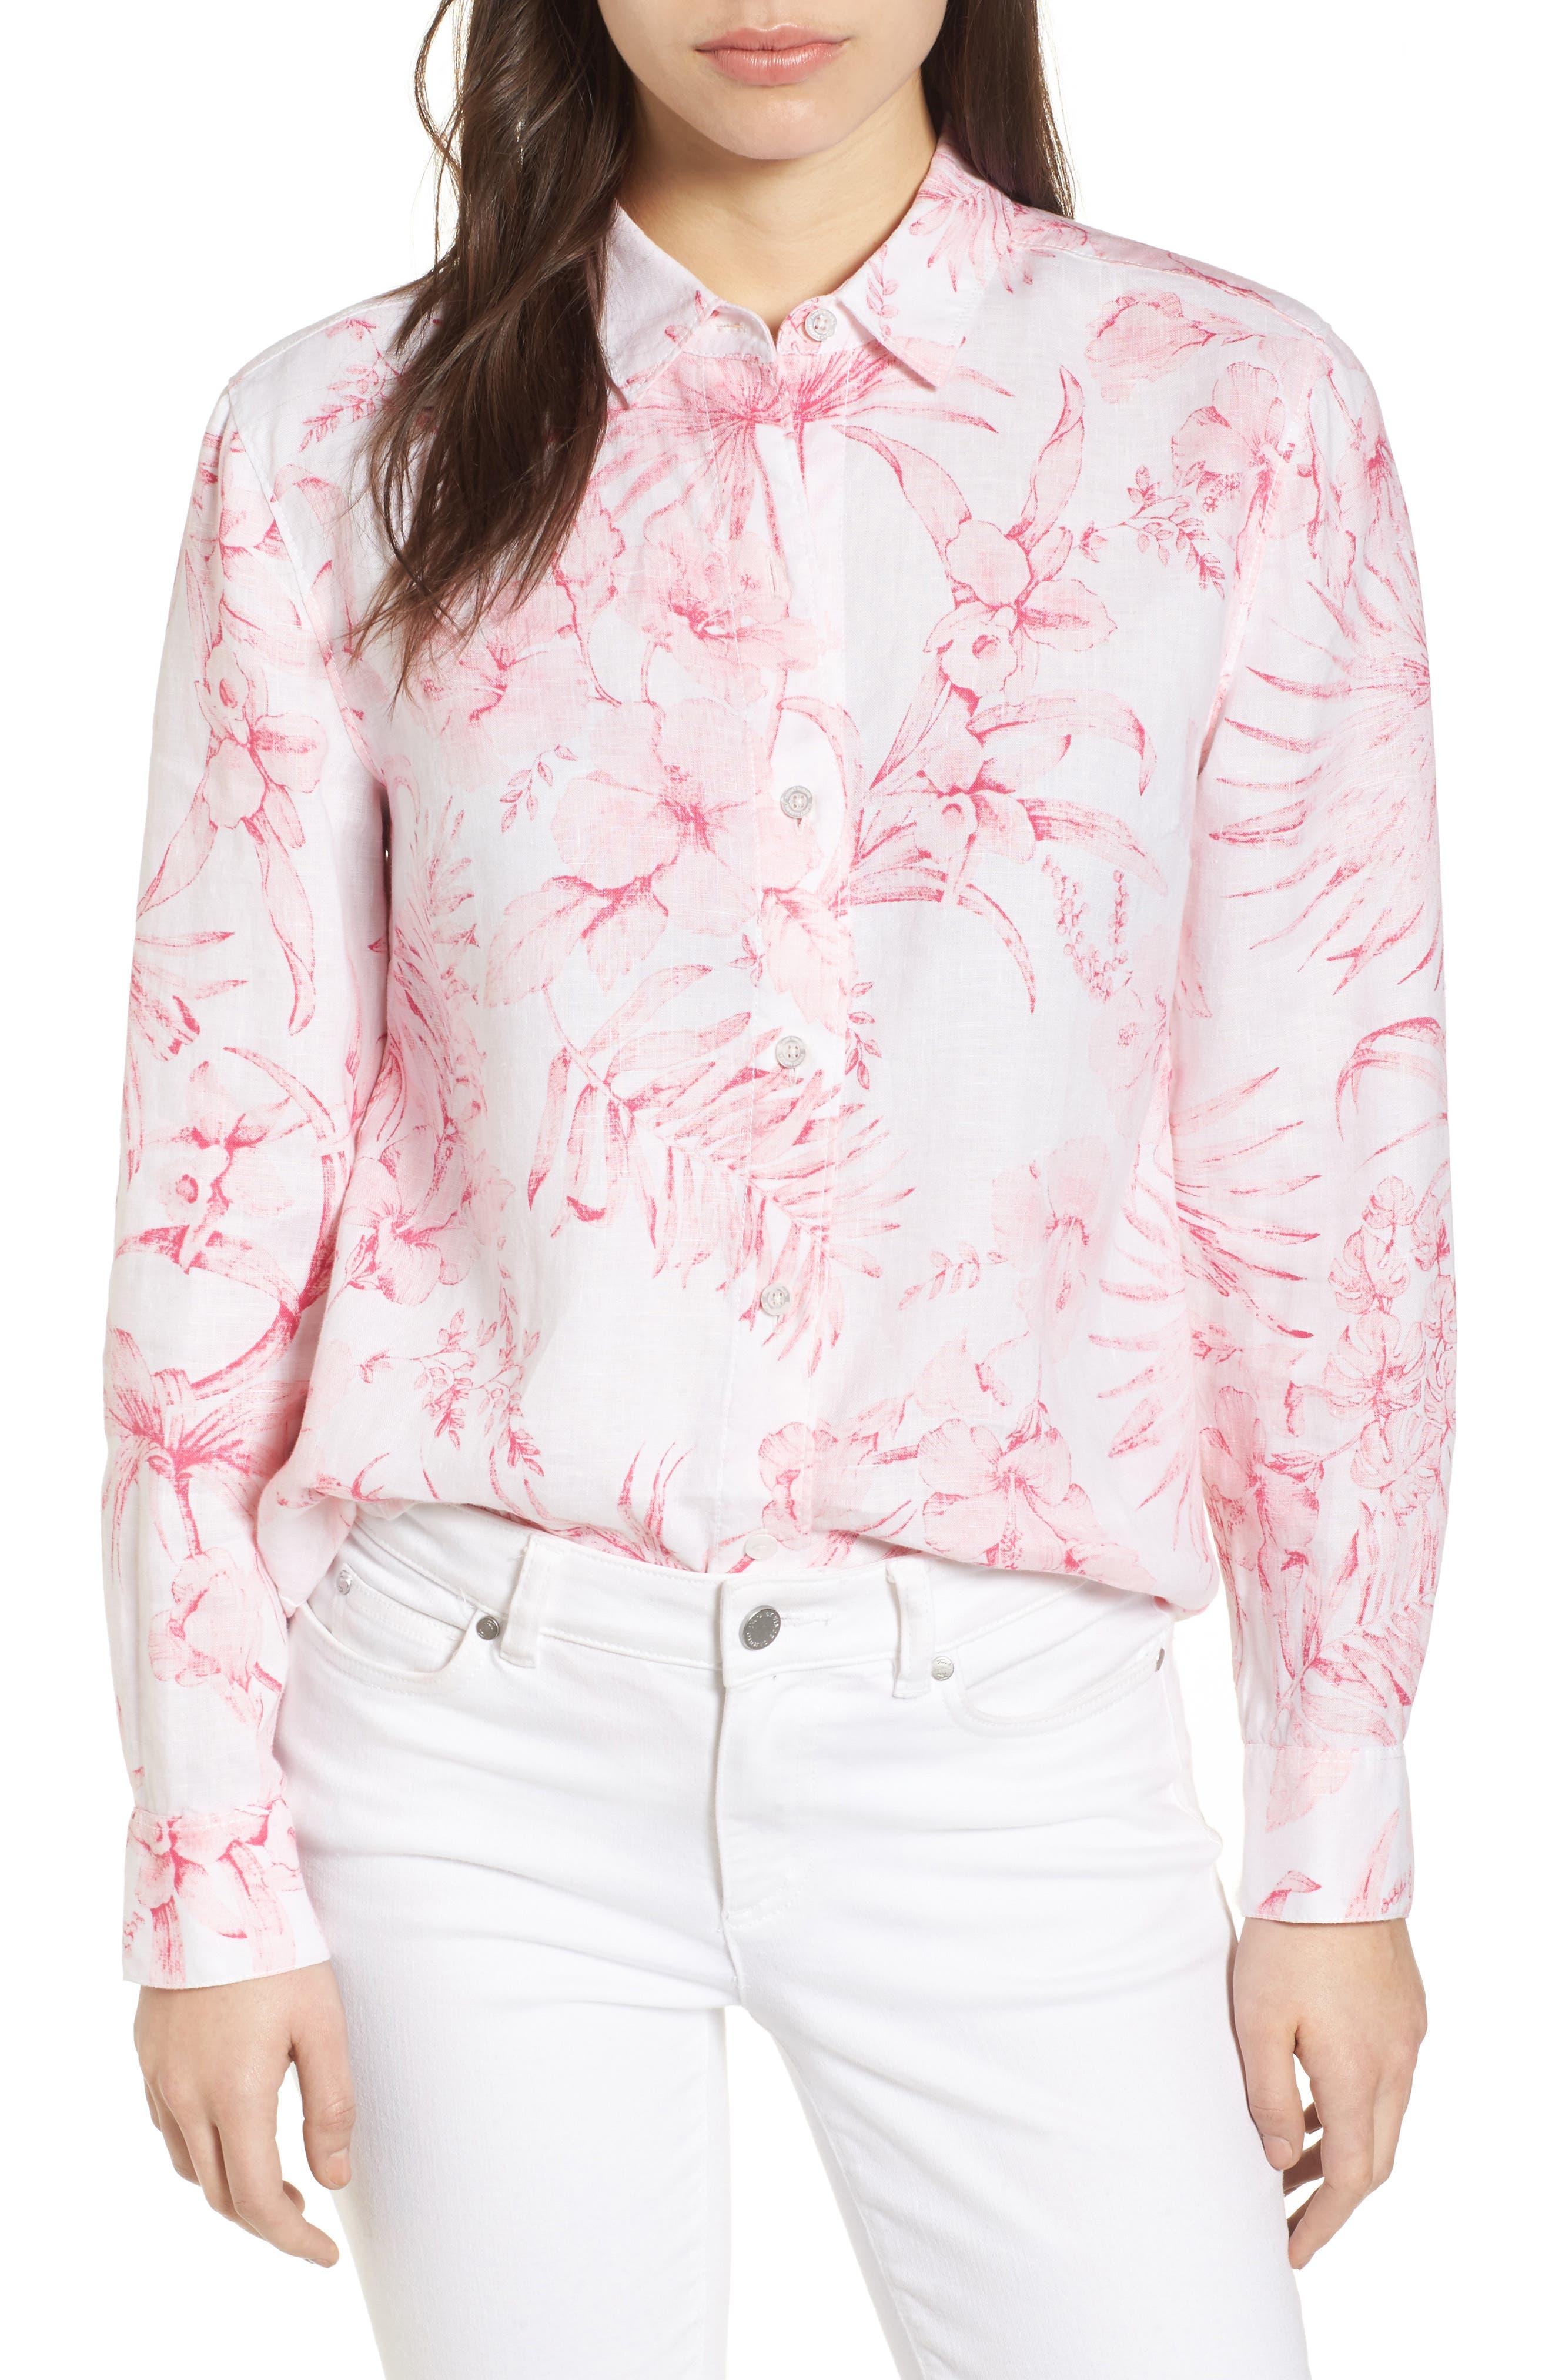 Tulum Tropical Linen Shirt,                         Main,                         color, PINK LACE